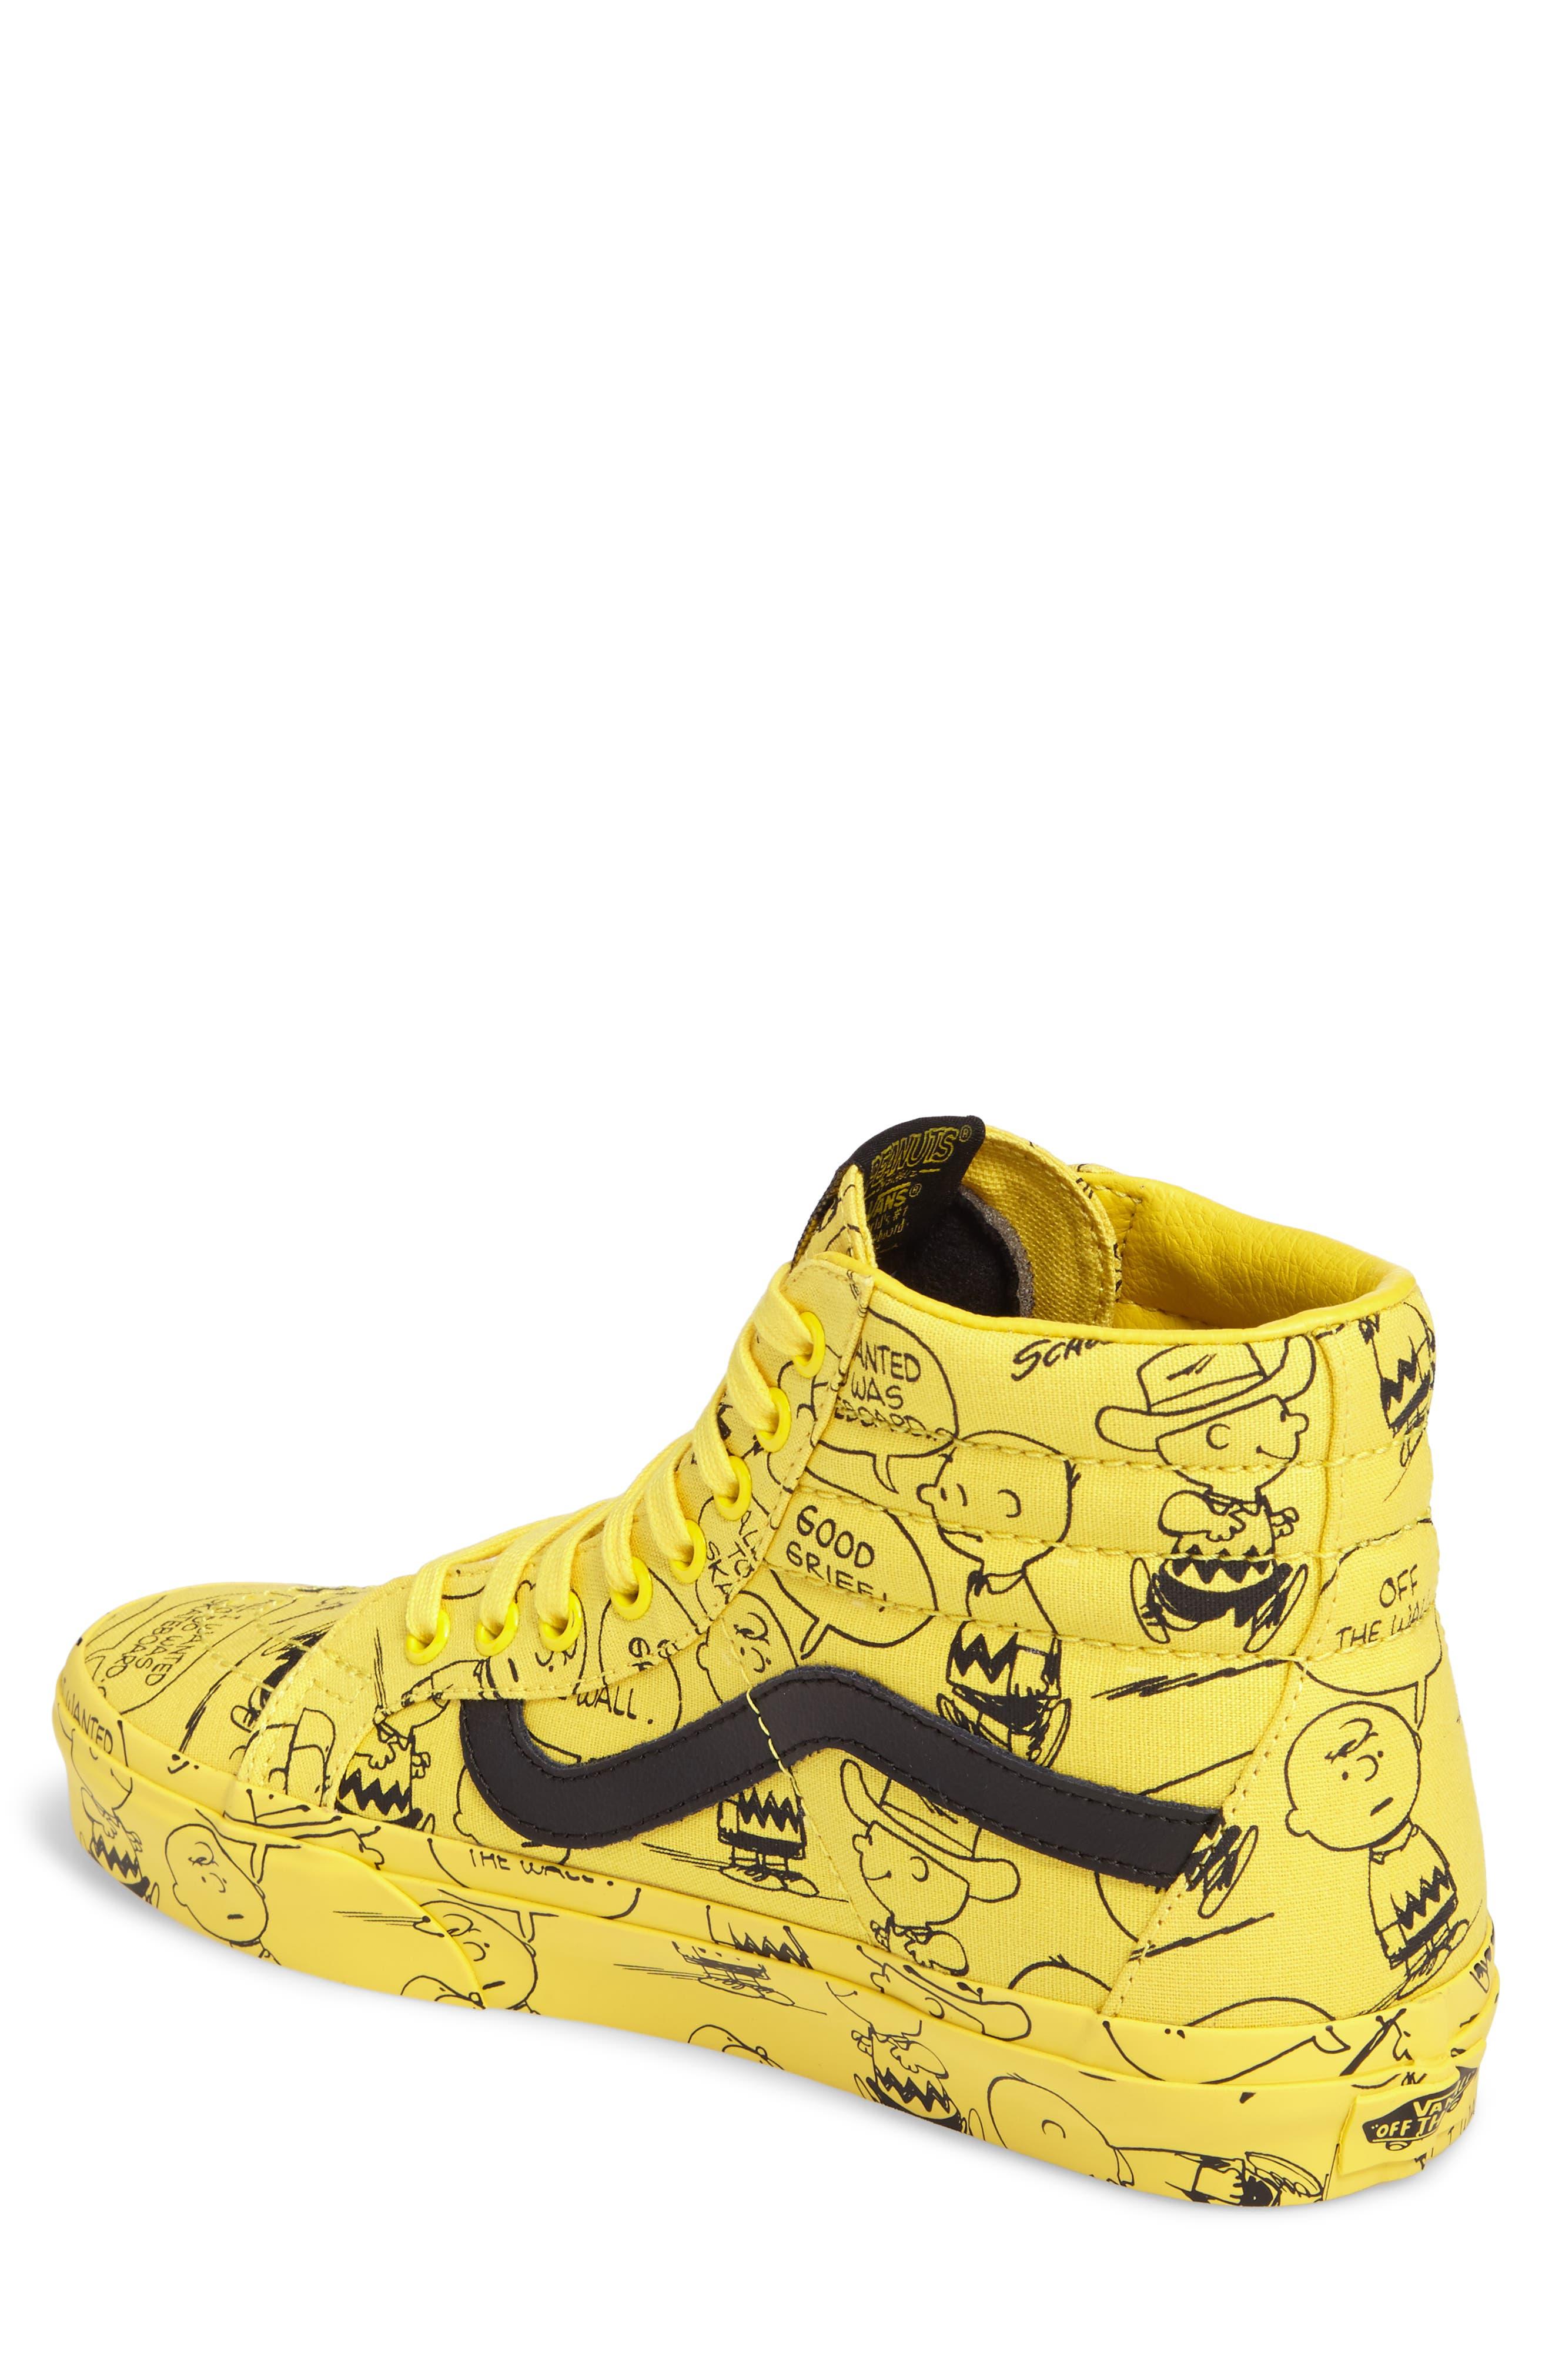 x Peanuts<sup>®</sup> Sk8-Hi Reissue Sneaker,                             Alternate thumbnail 2, color,                             Maize Canvas